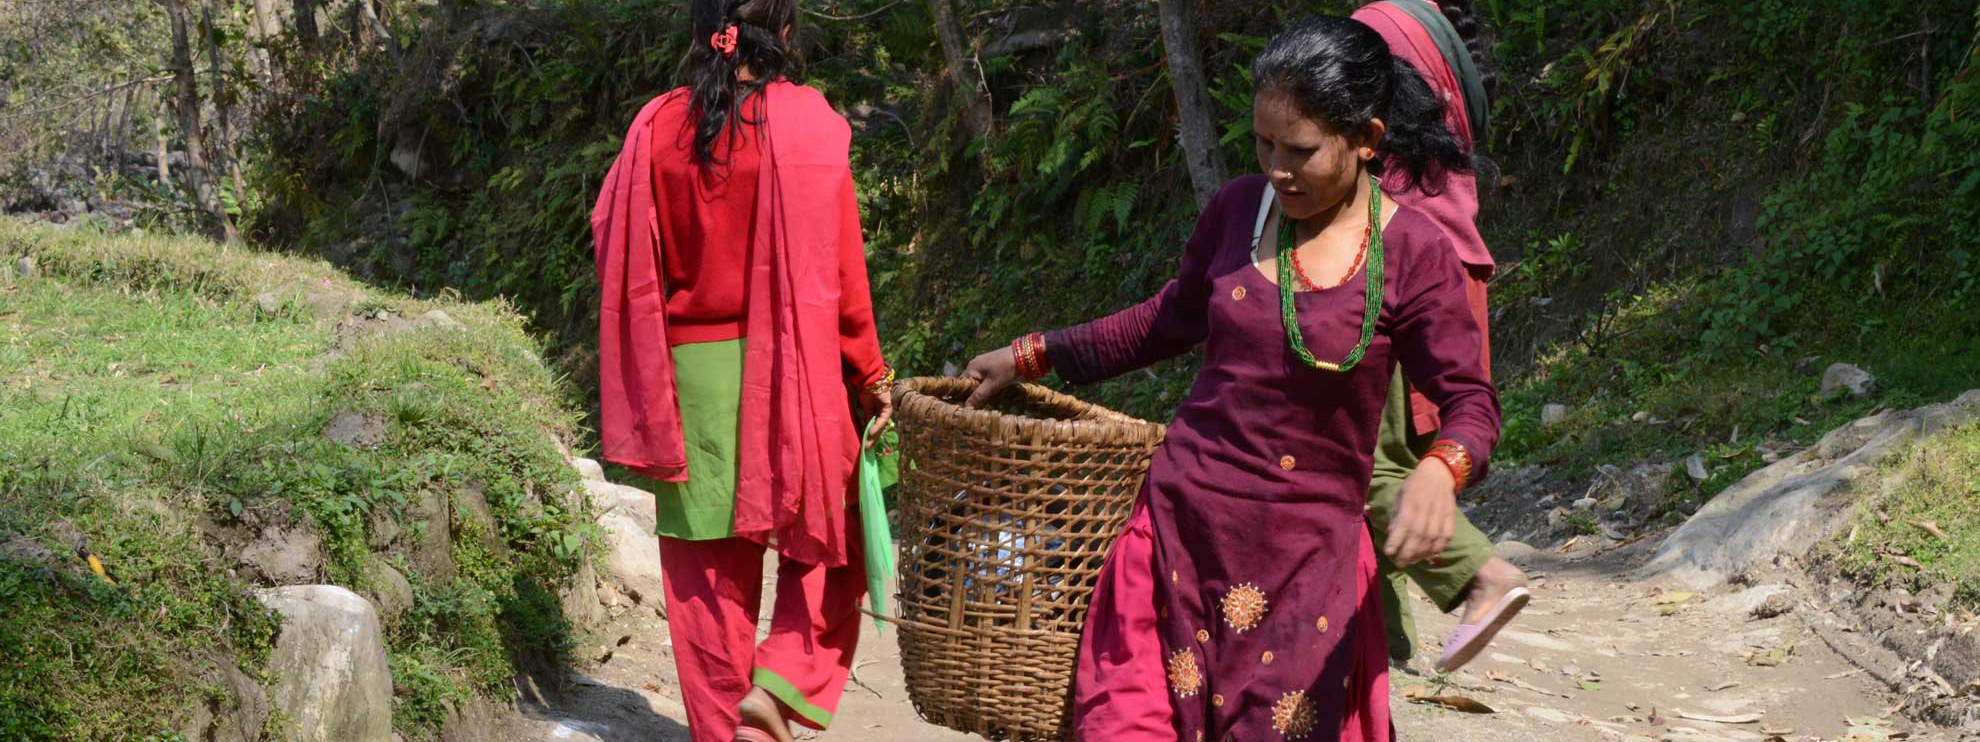 Paysannes népalaises © Amnesty International (Photo: Prakash Mathema)